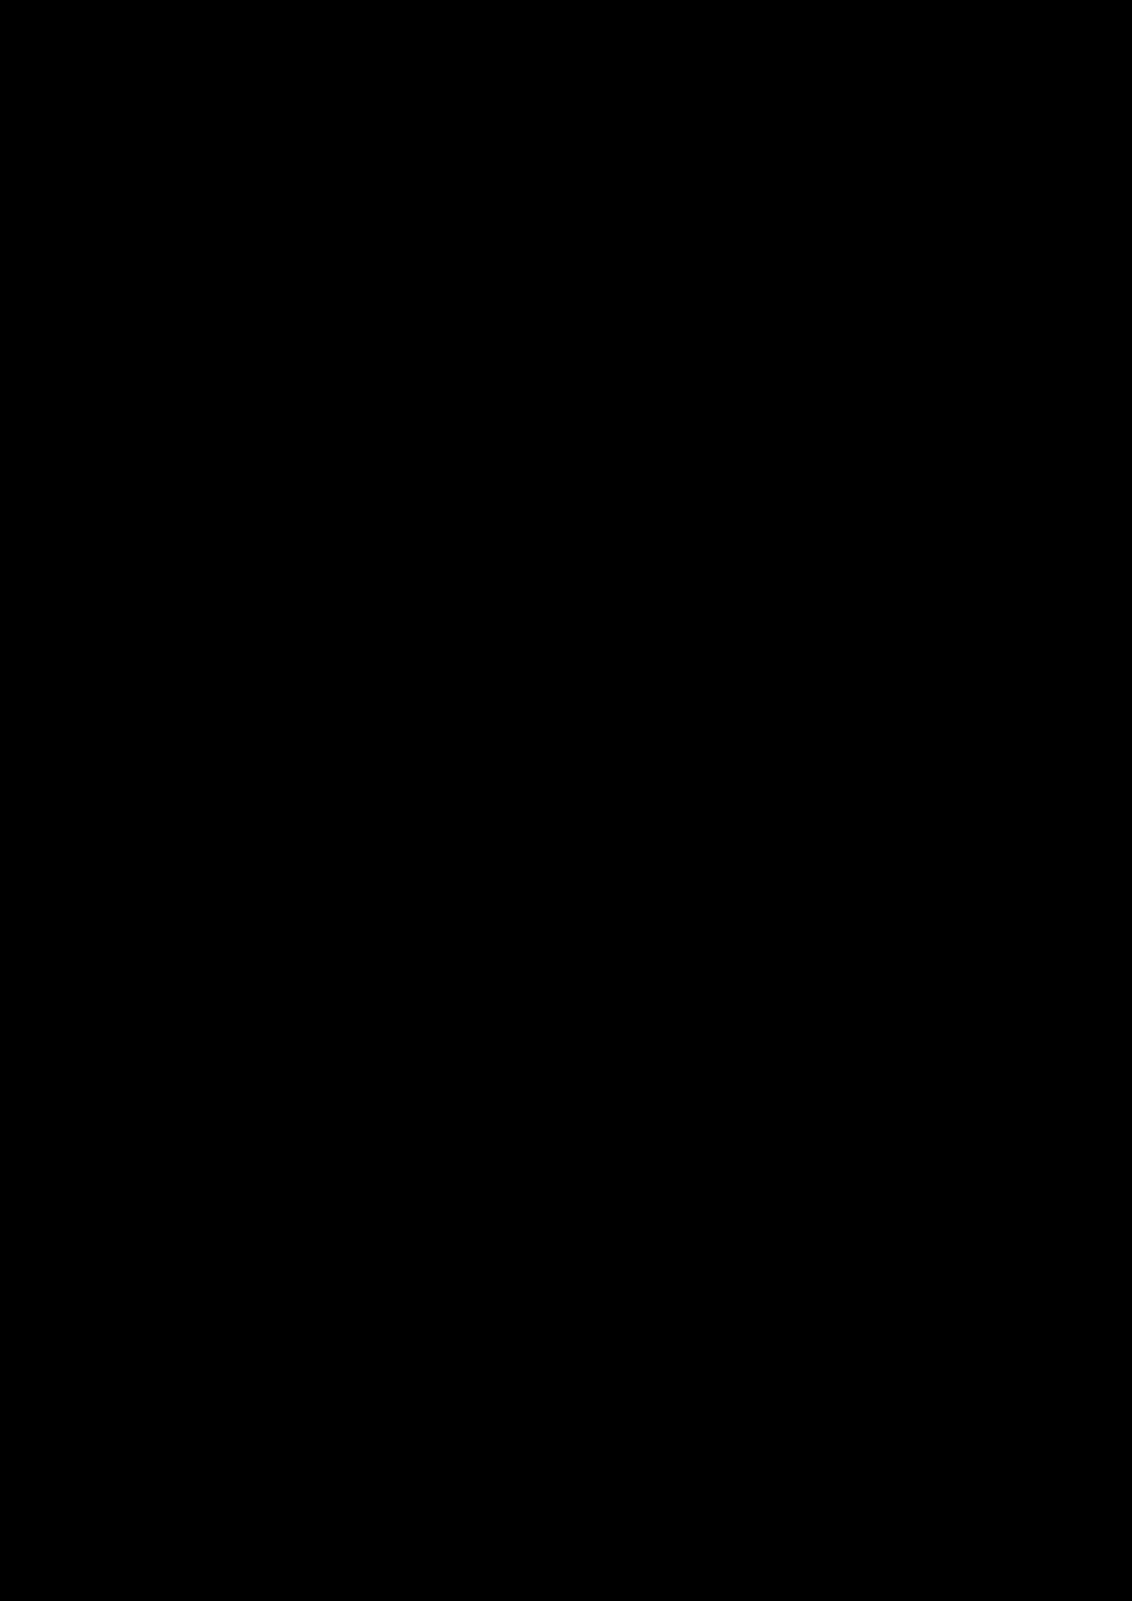 Korolevstvo slez slide, Image 10